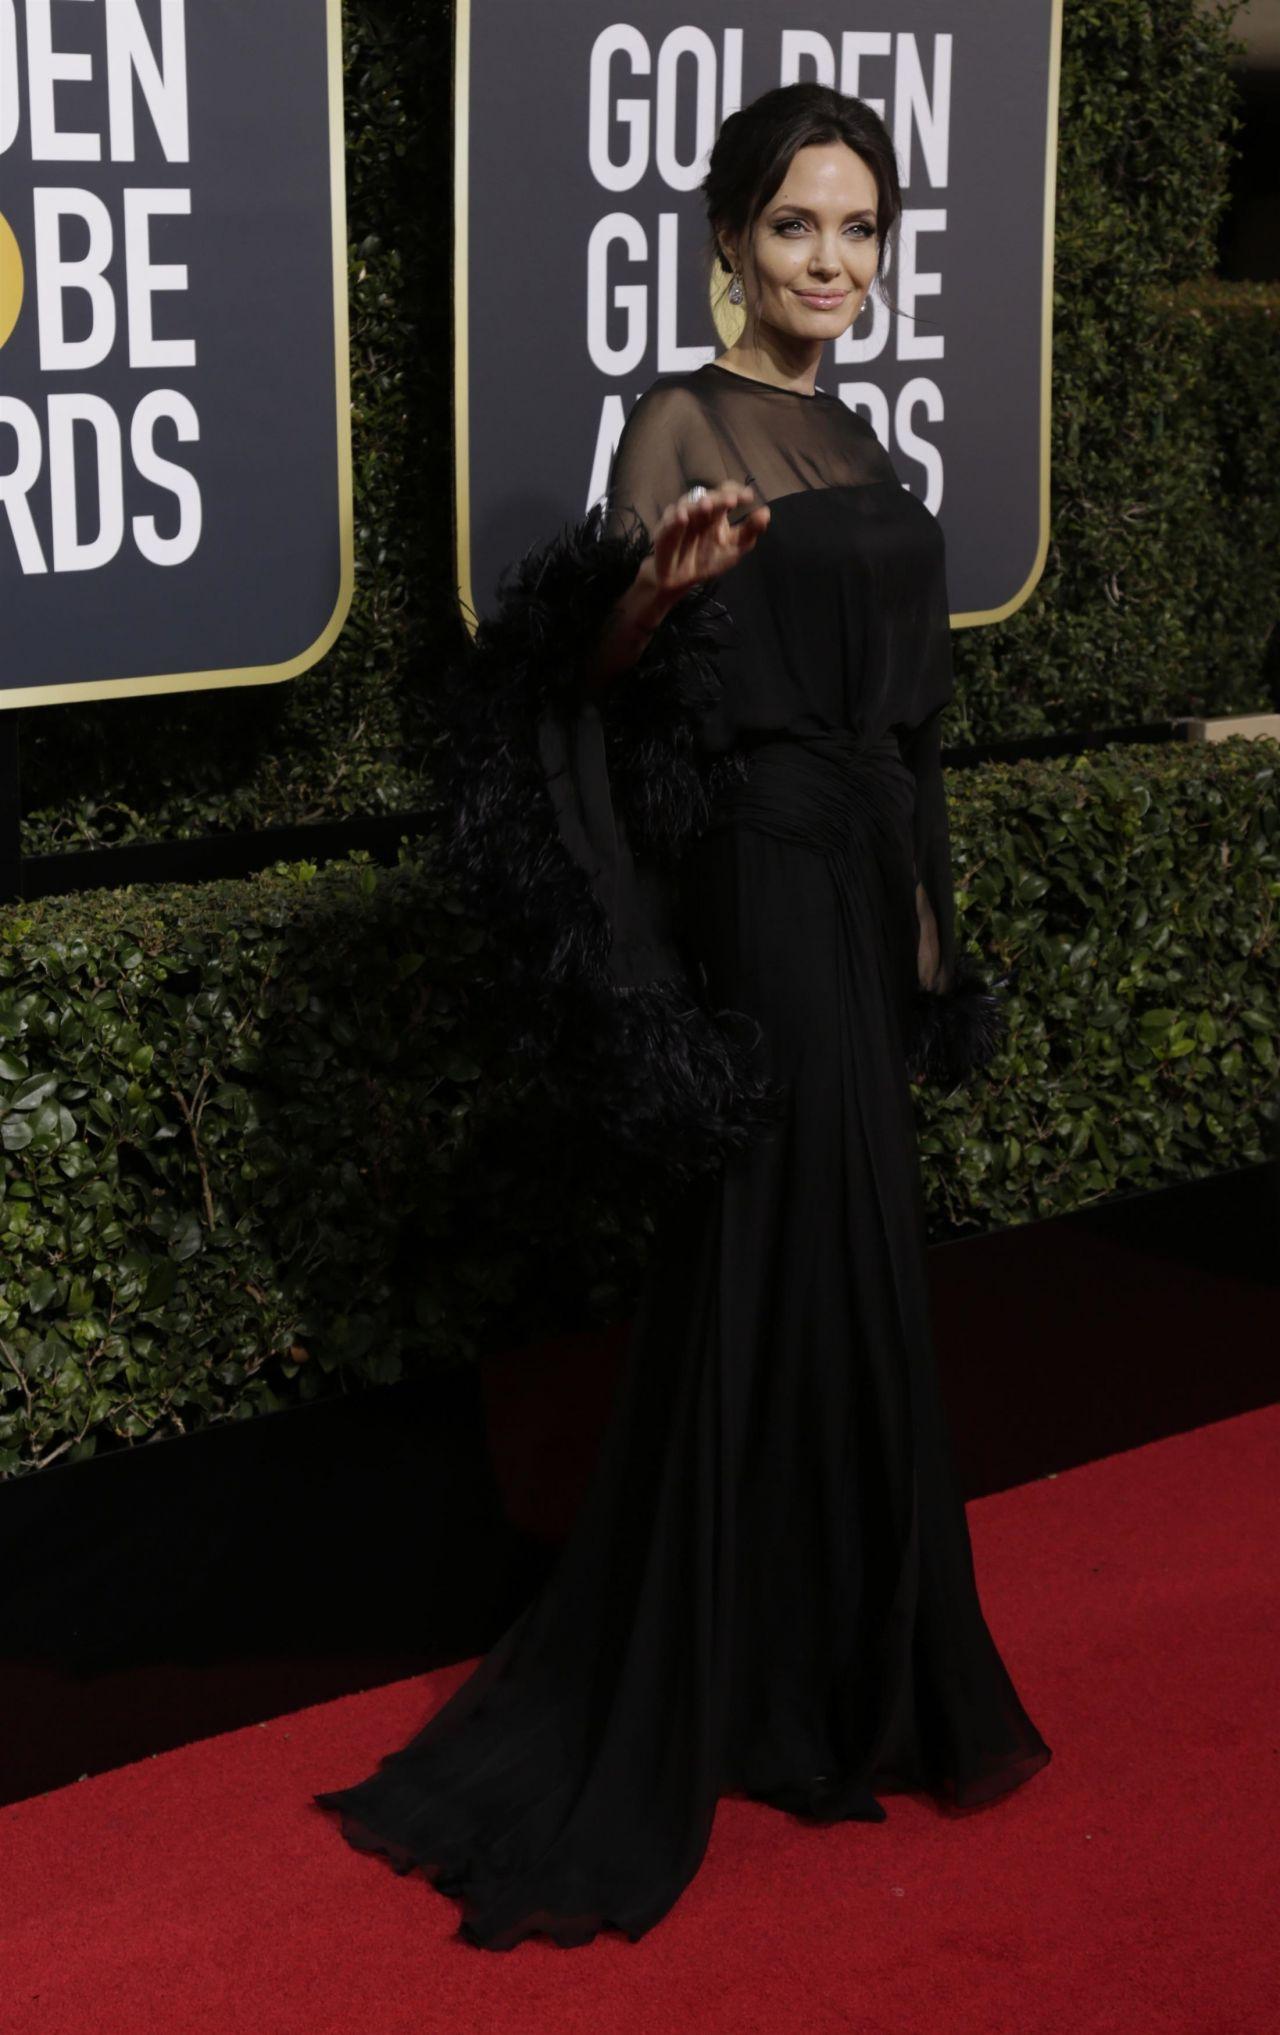 http://celebmafia.com/wp-content/uploads/2018/01/angelina-jolie-golden-globe-awards-2018-0.jpg